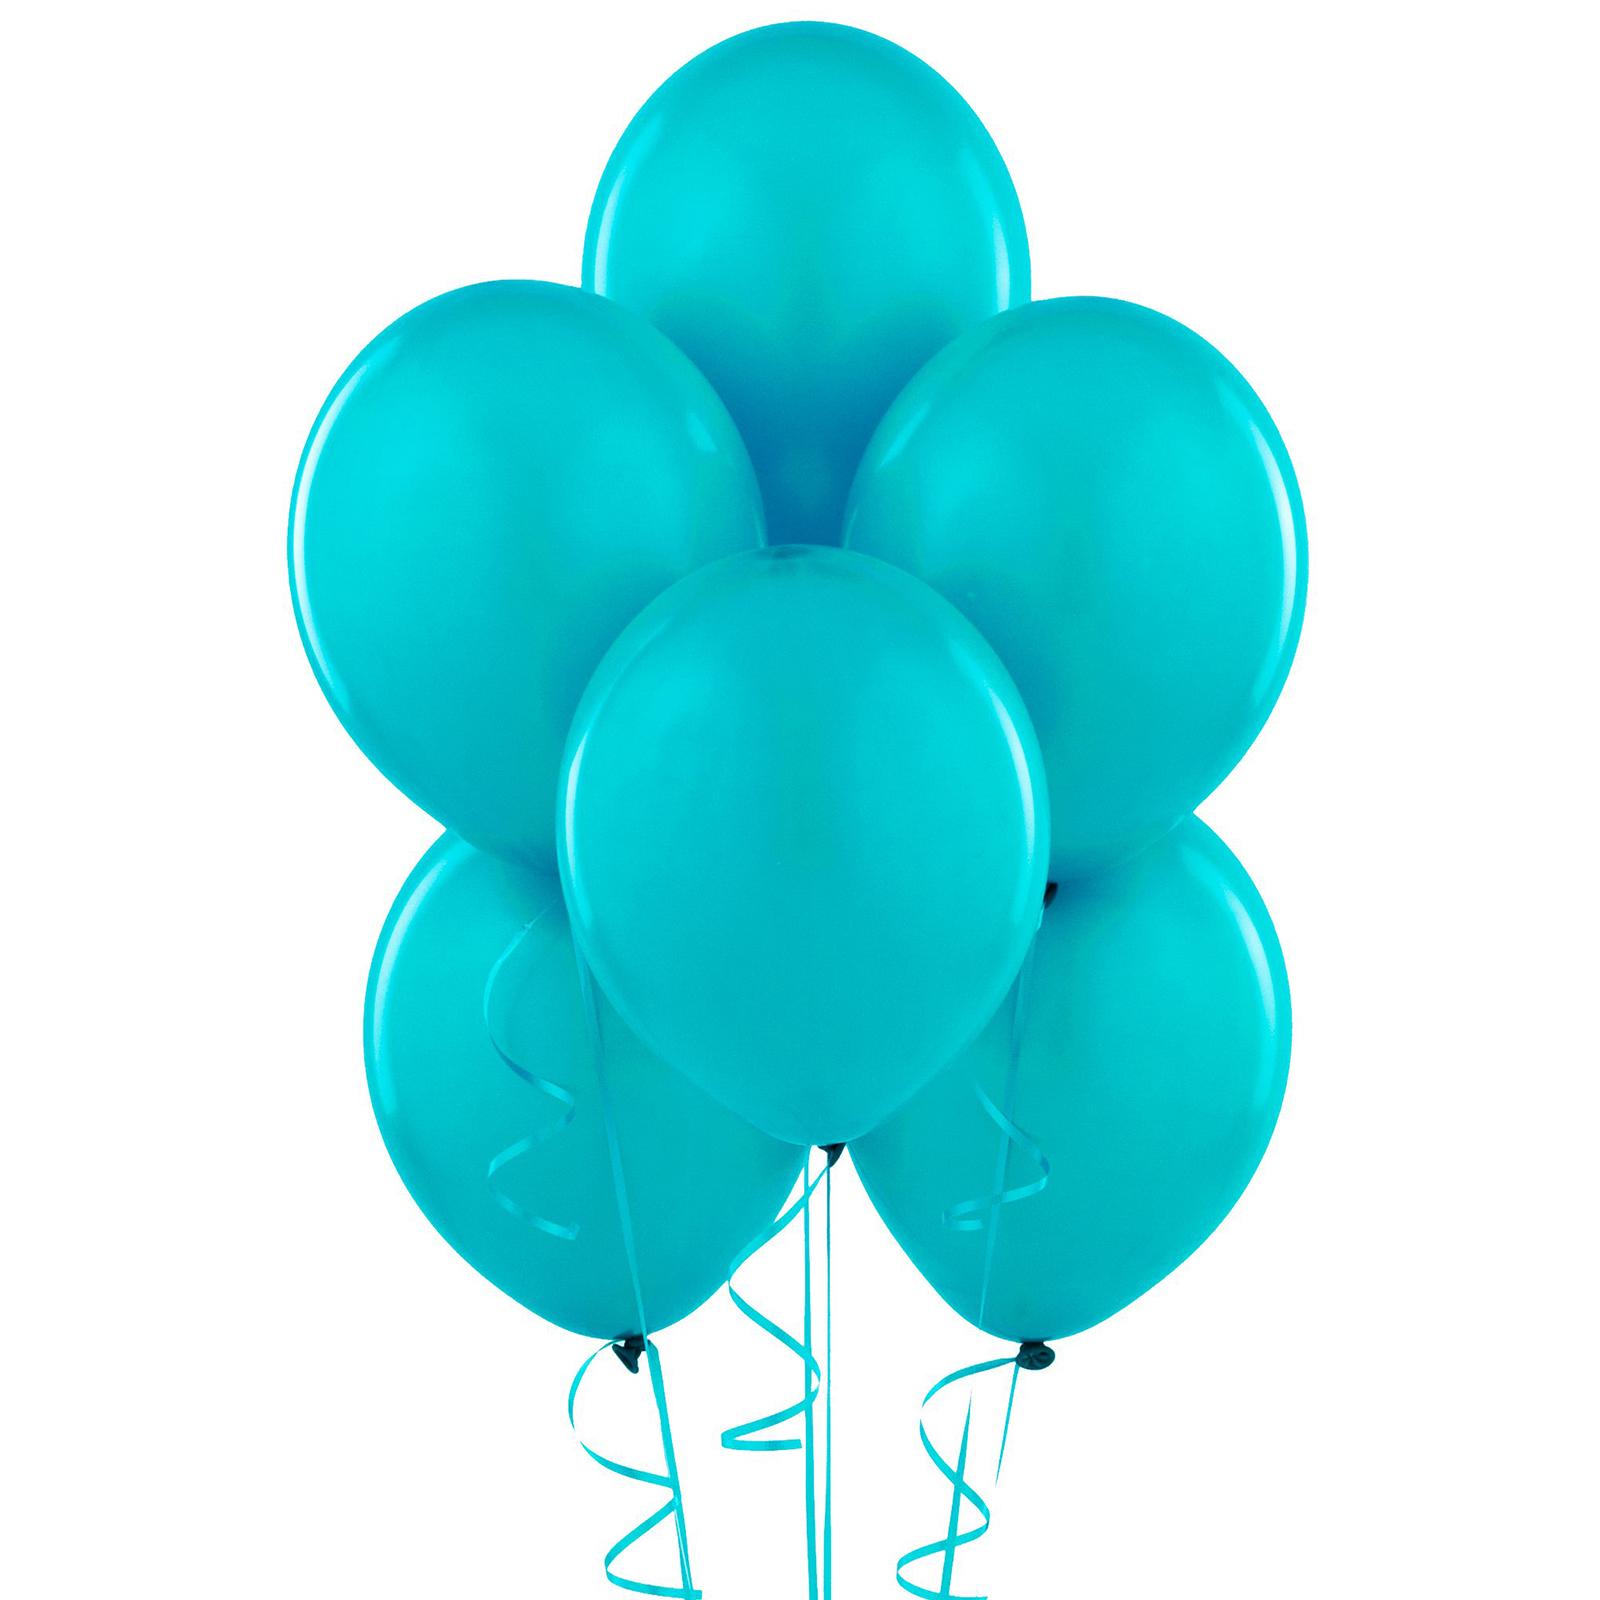 bermuda blue turquoise matte